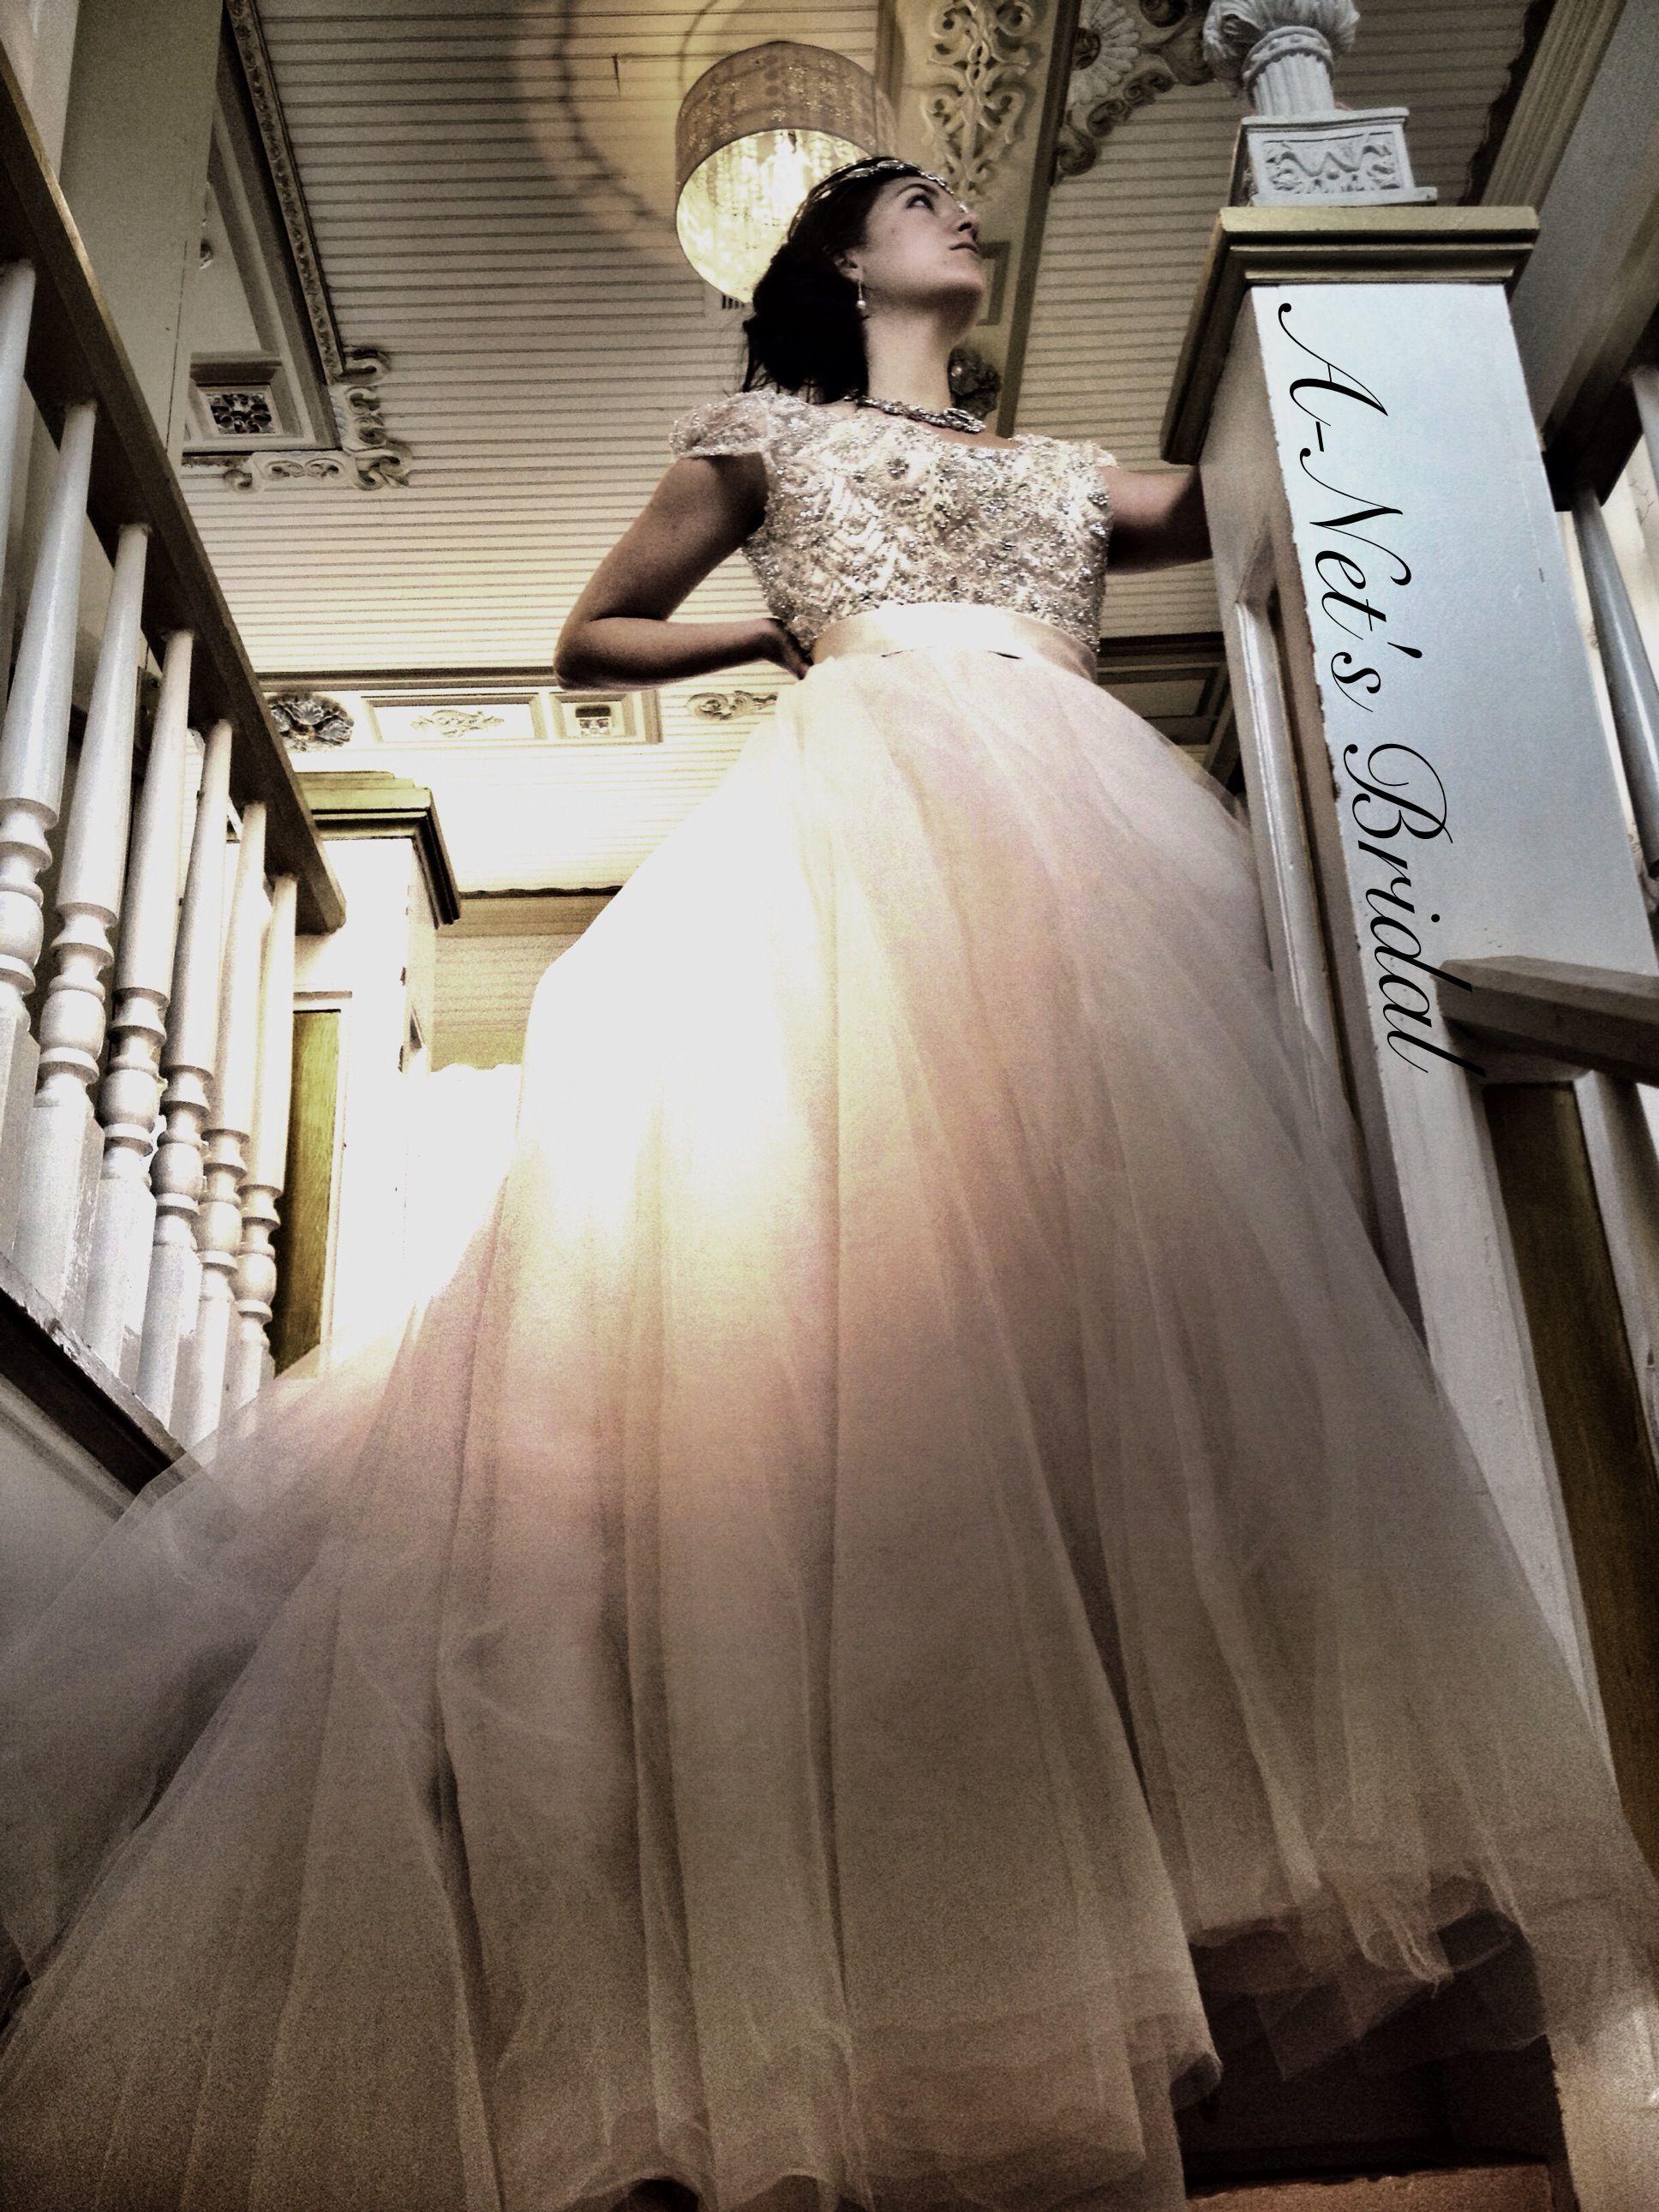 Visit Us At Anetsbridalboutique Com And Follow Us On Facebook At Www Facebook Com Anetsbridal Wedding Dresses Lace Bridal Dresses Dresses